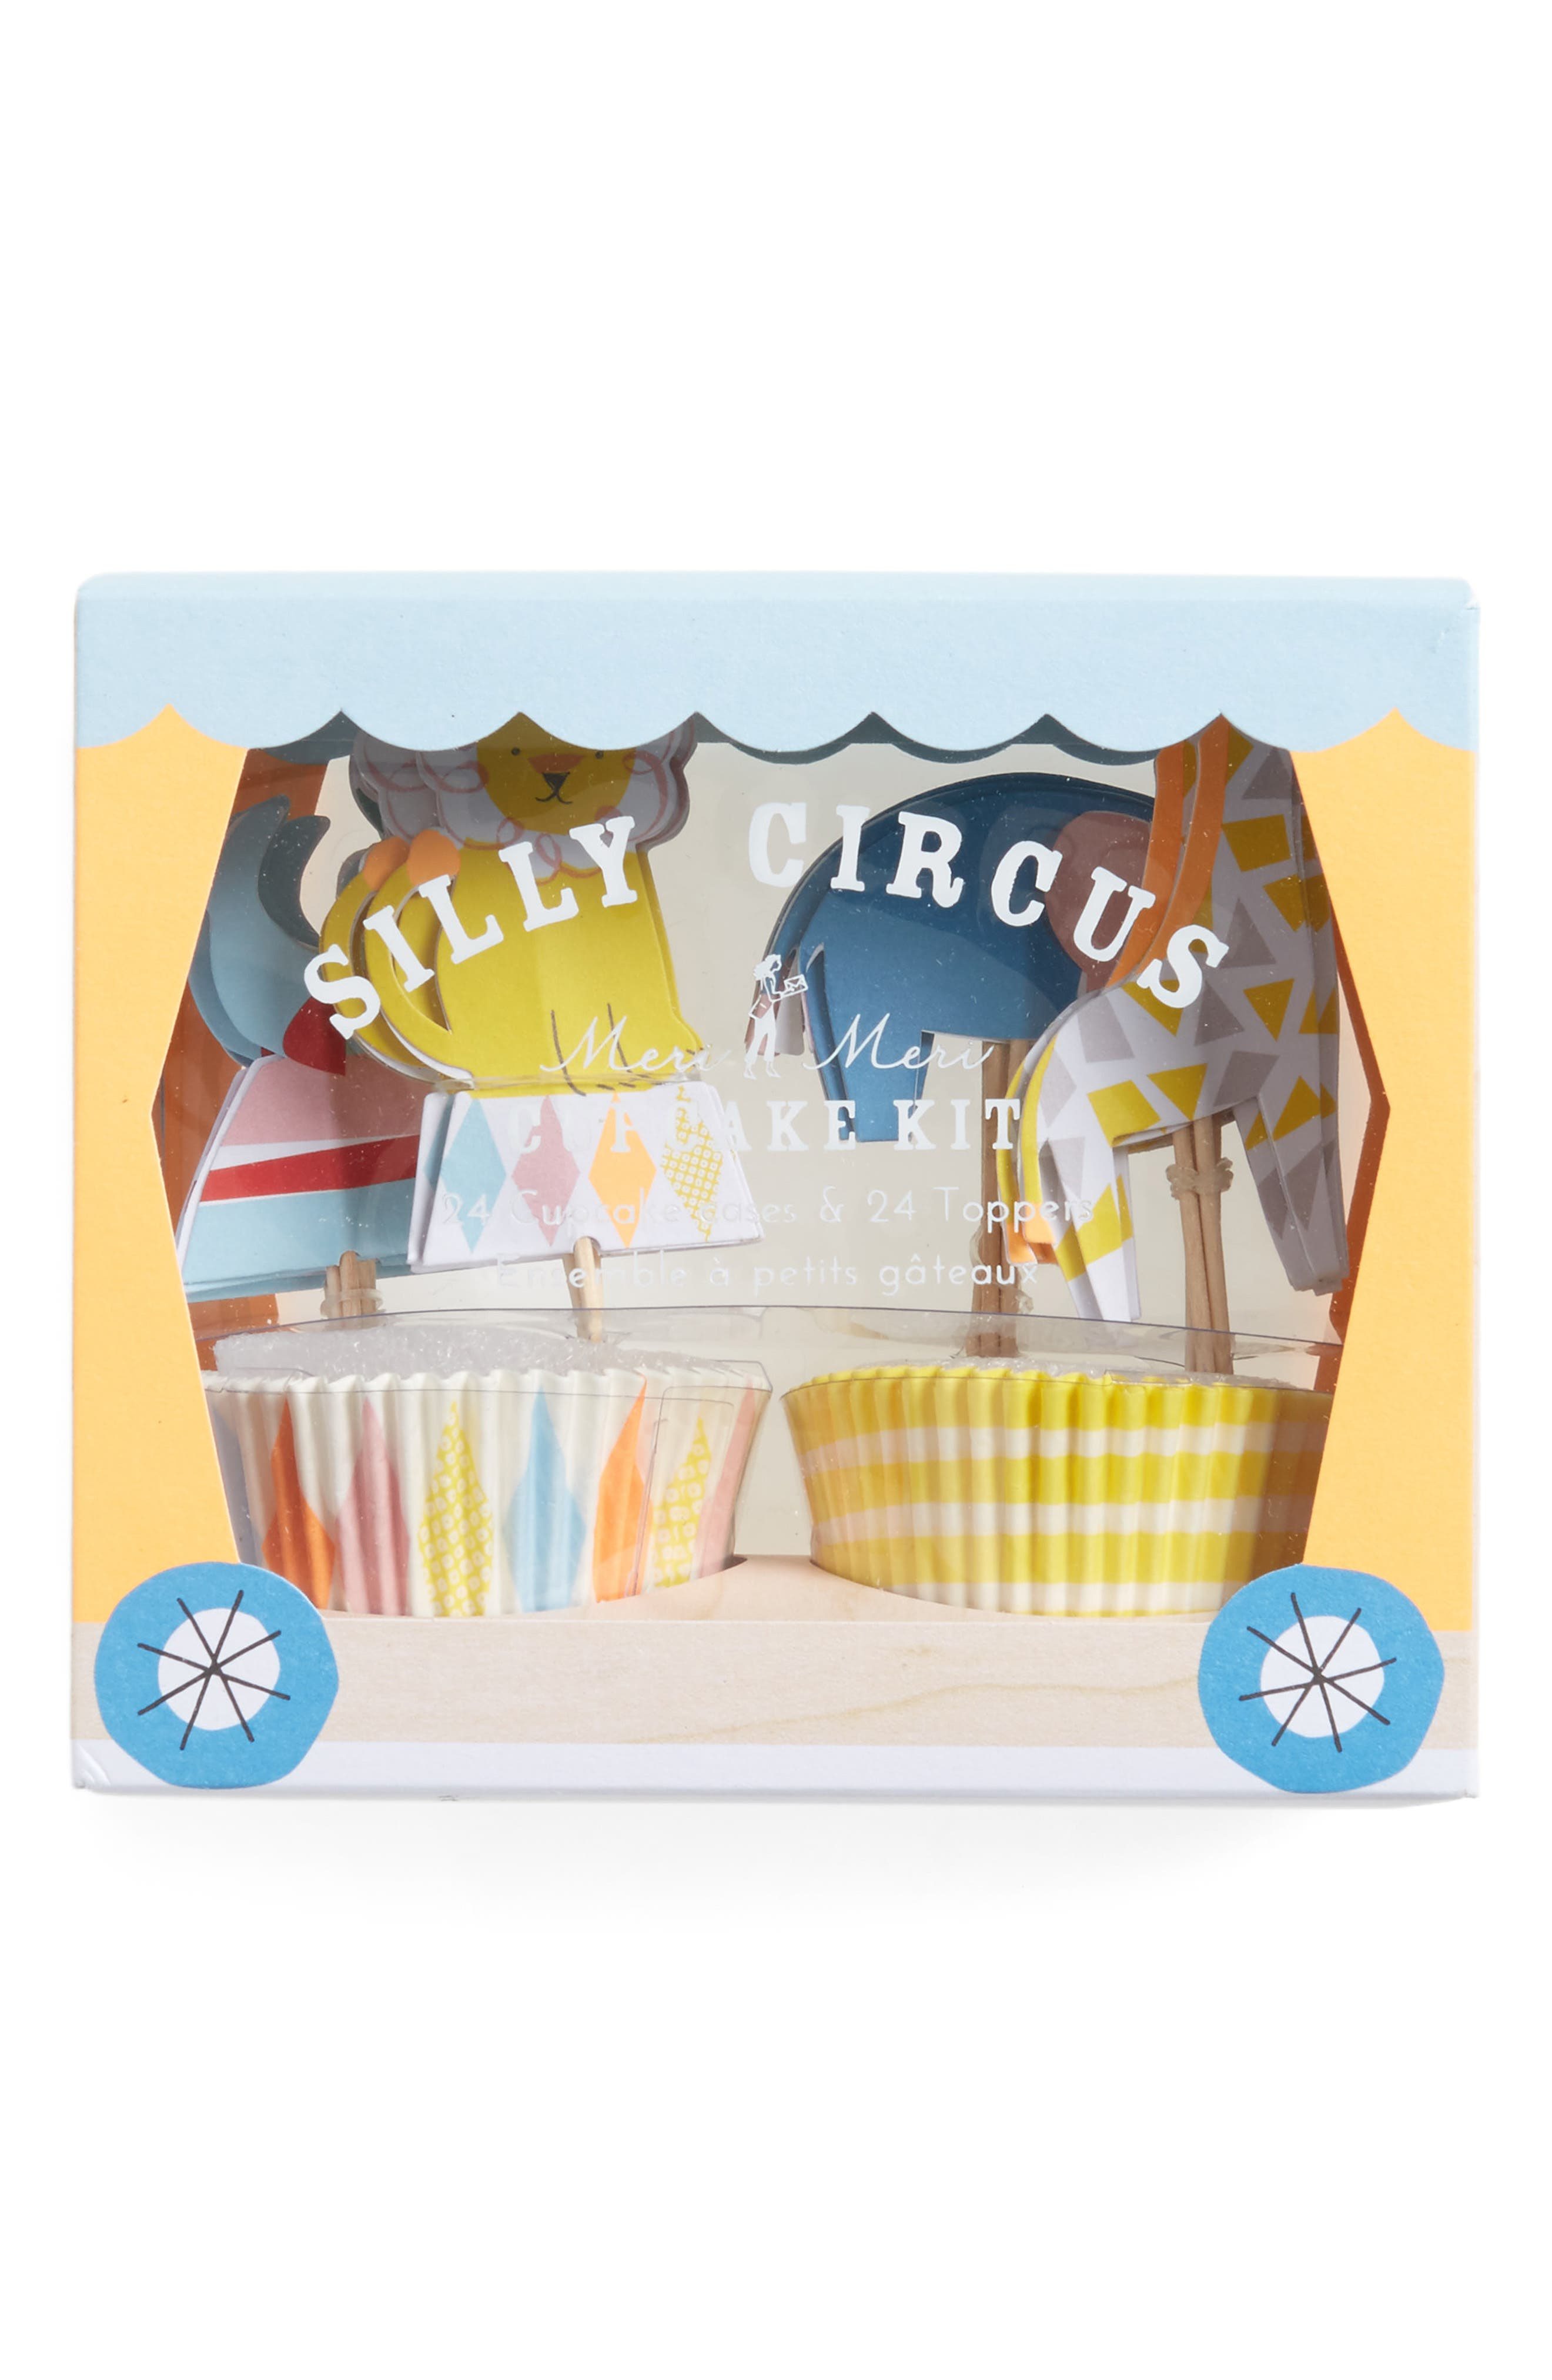 Alternate Image 1 Selected - Meri Meri Silly Circus Cupcake Kit